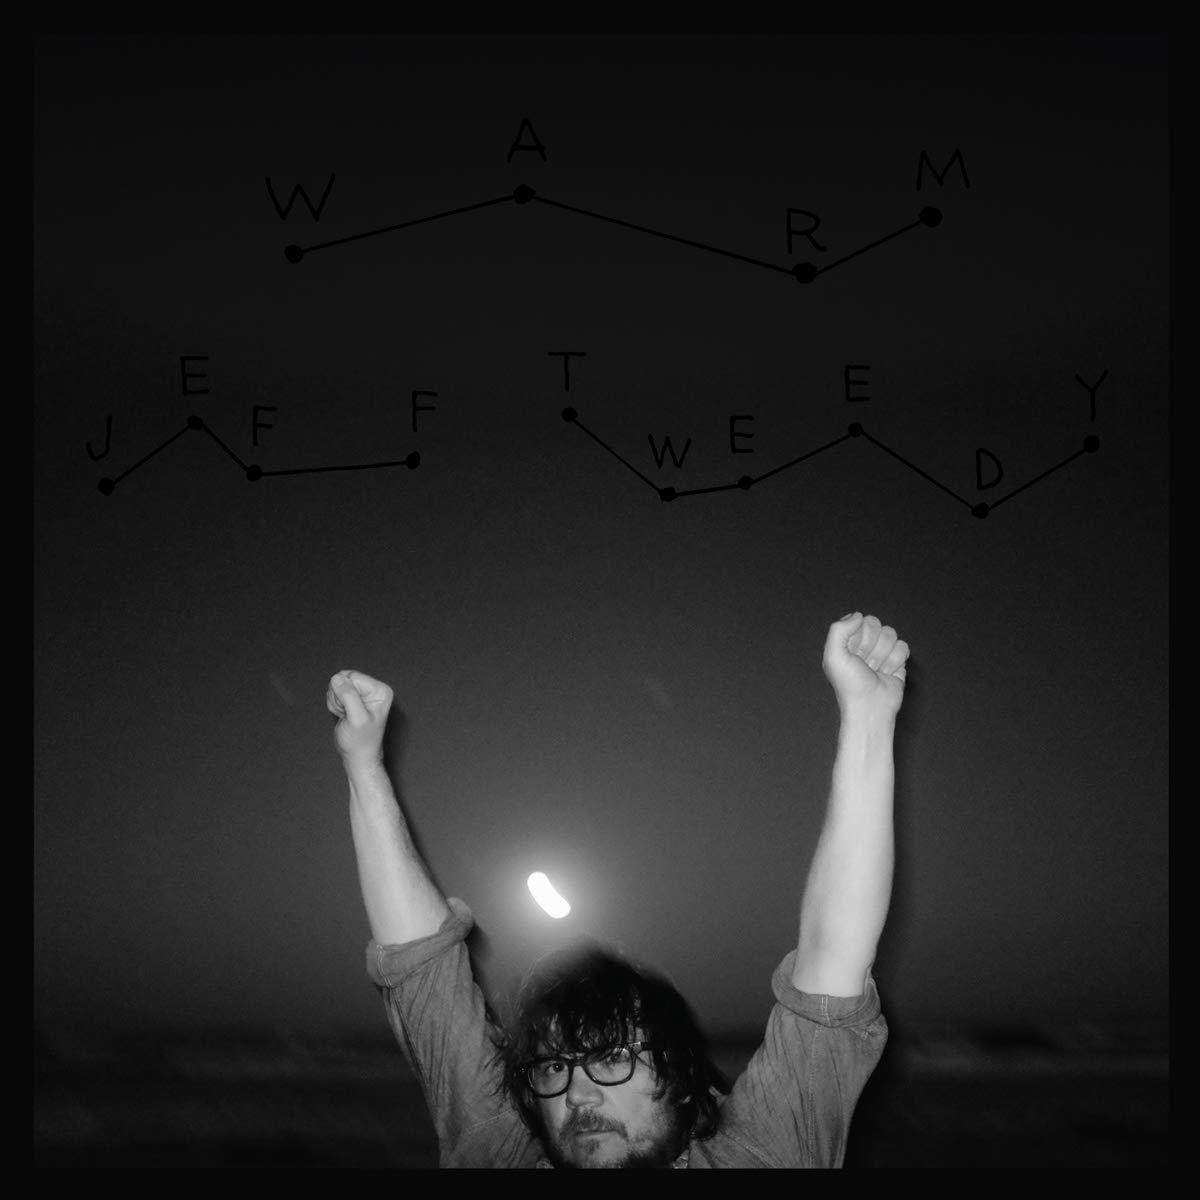 CD : Jeff Tweedy - Warm (CD)